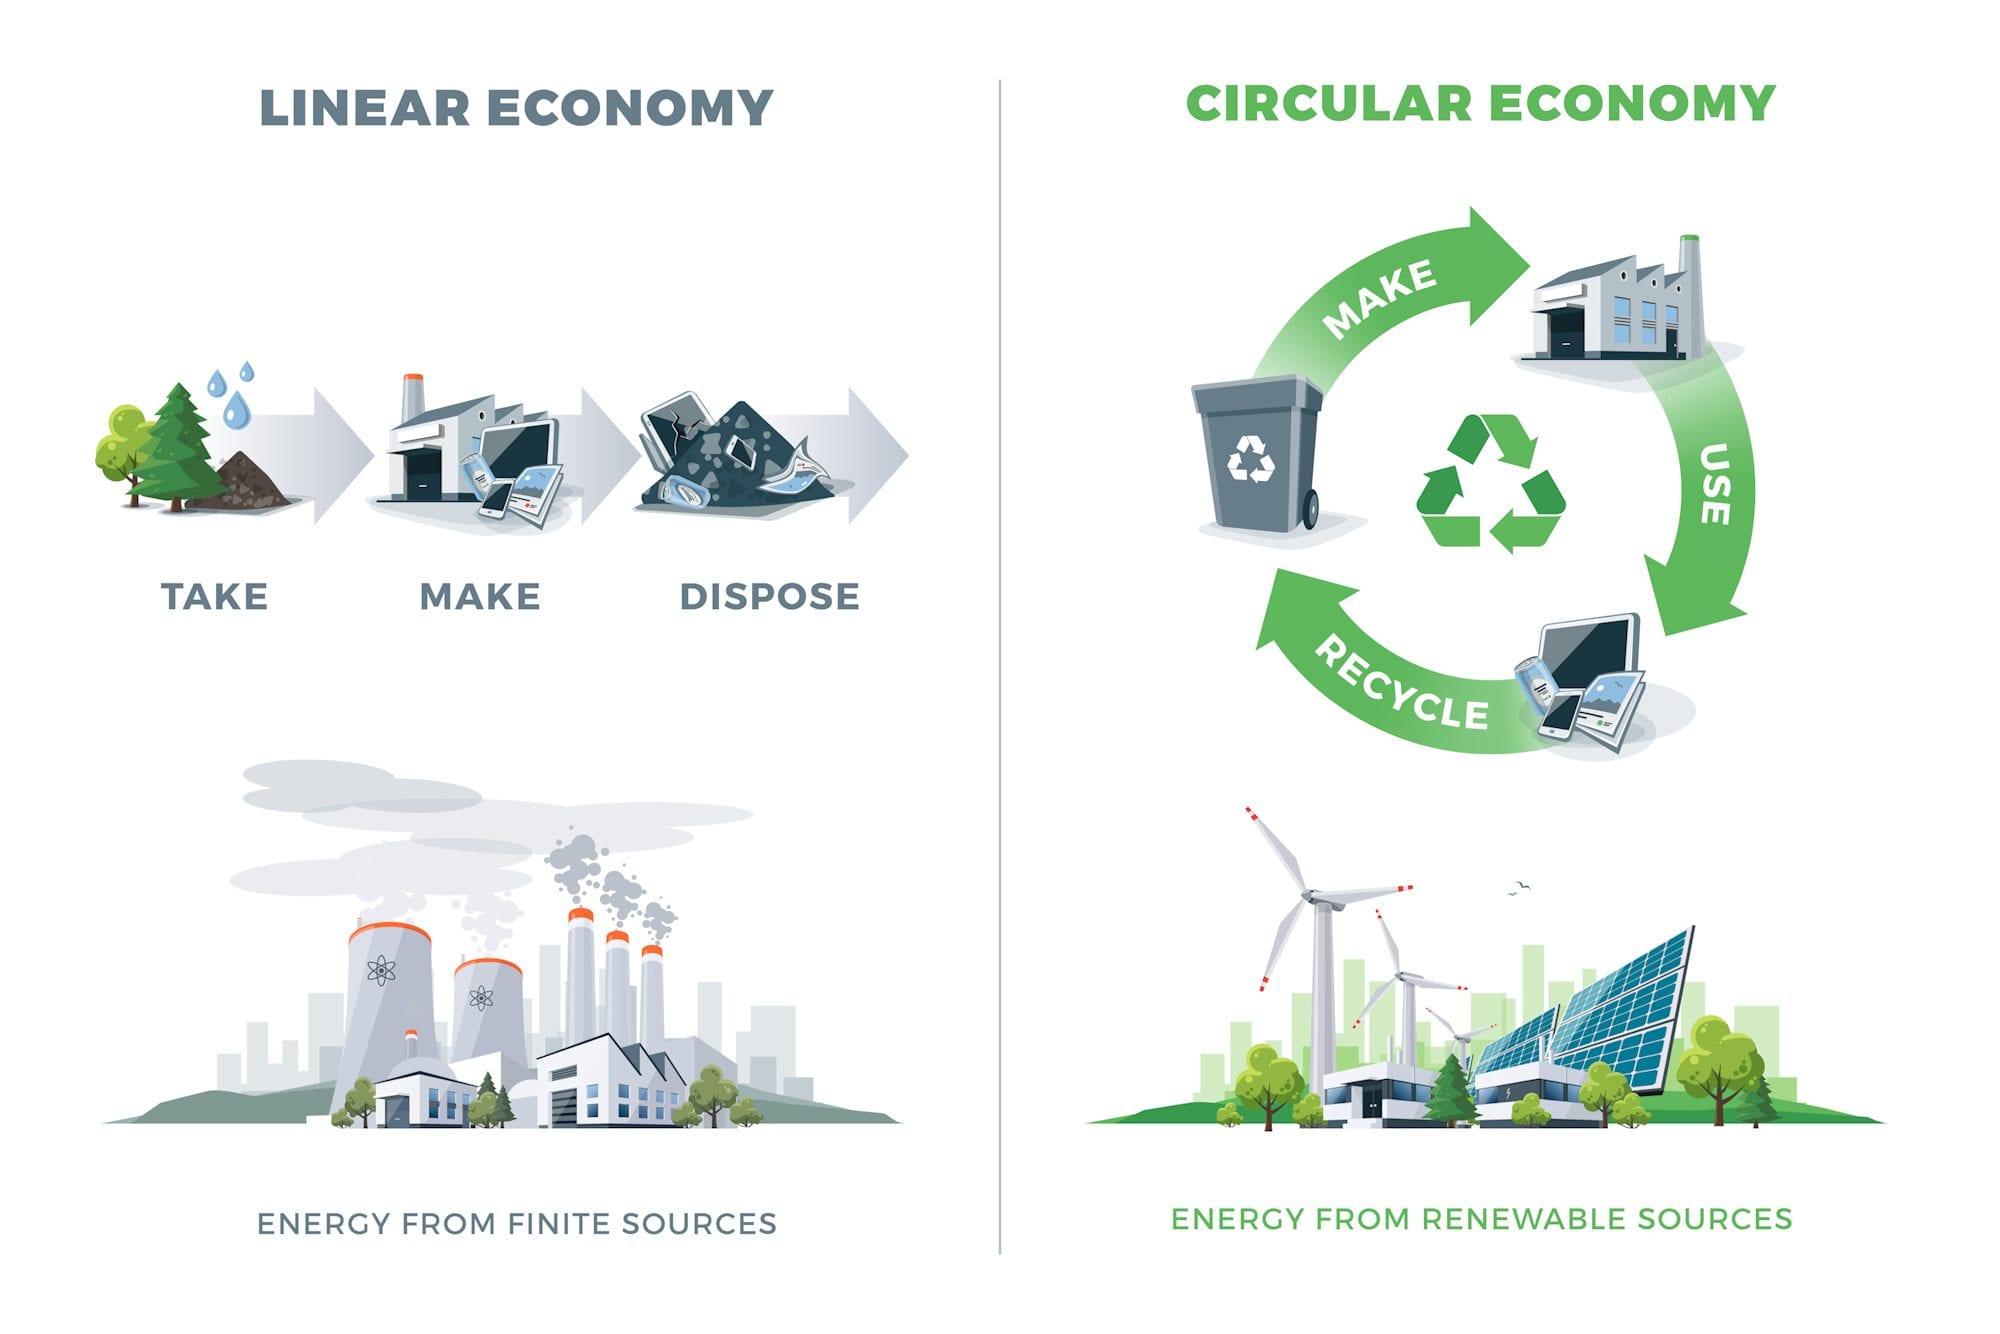 Image of linear economy versus circular economyerstock